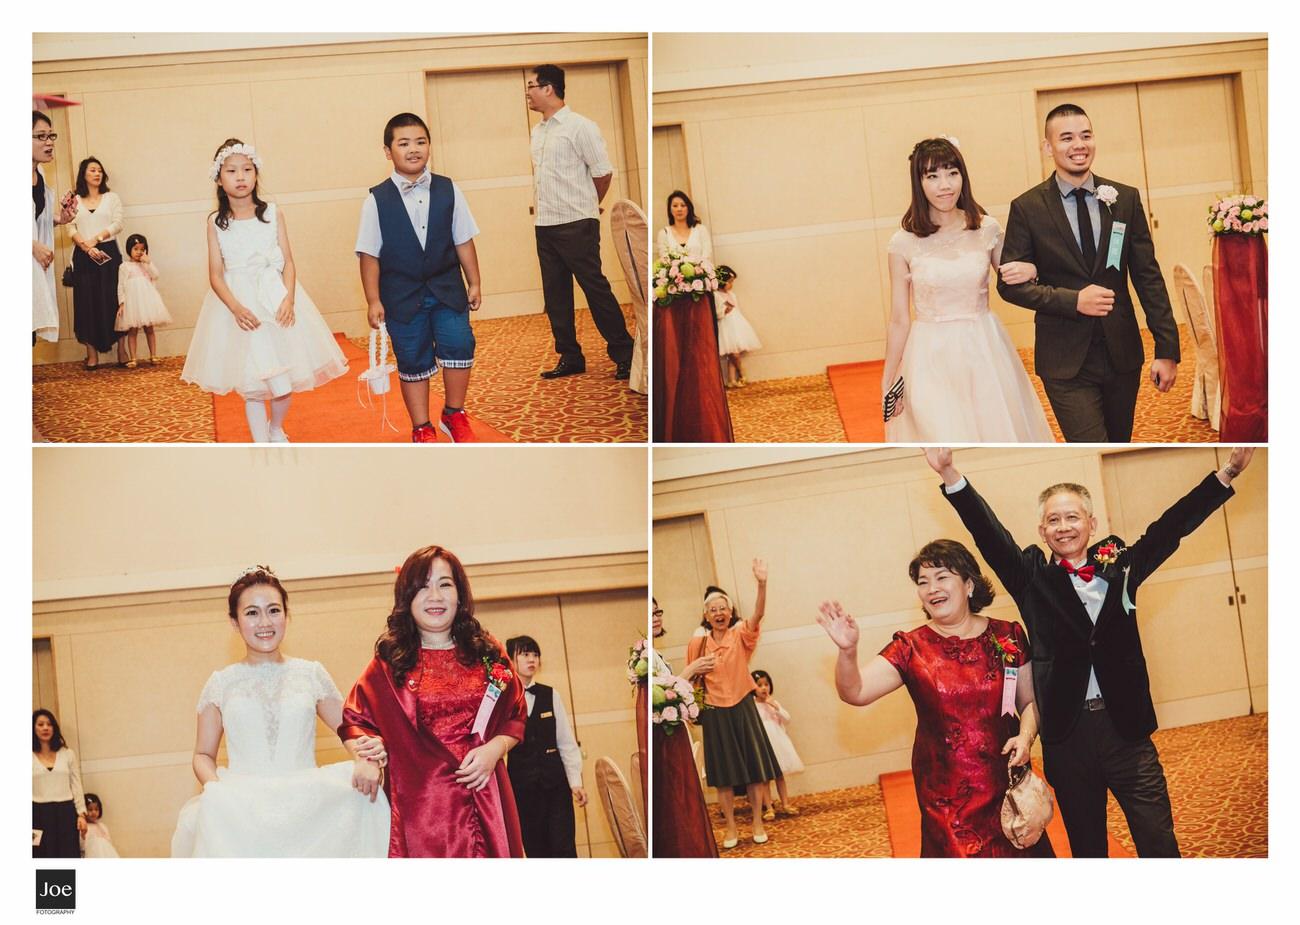 sunworld-dynasty-hotel-taipei-wedding-photo-joe-fotography-angel-jay-068.jpg